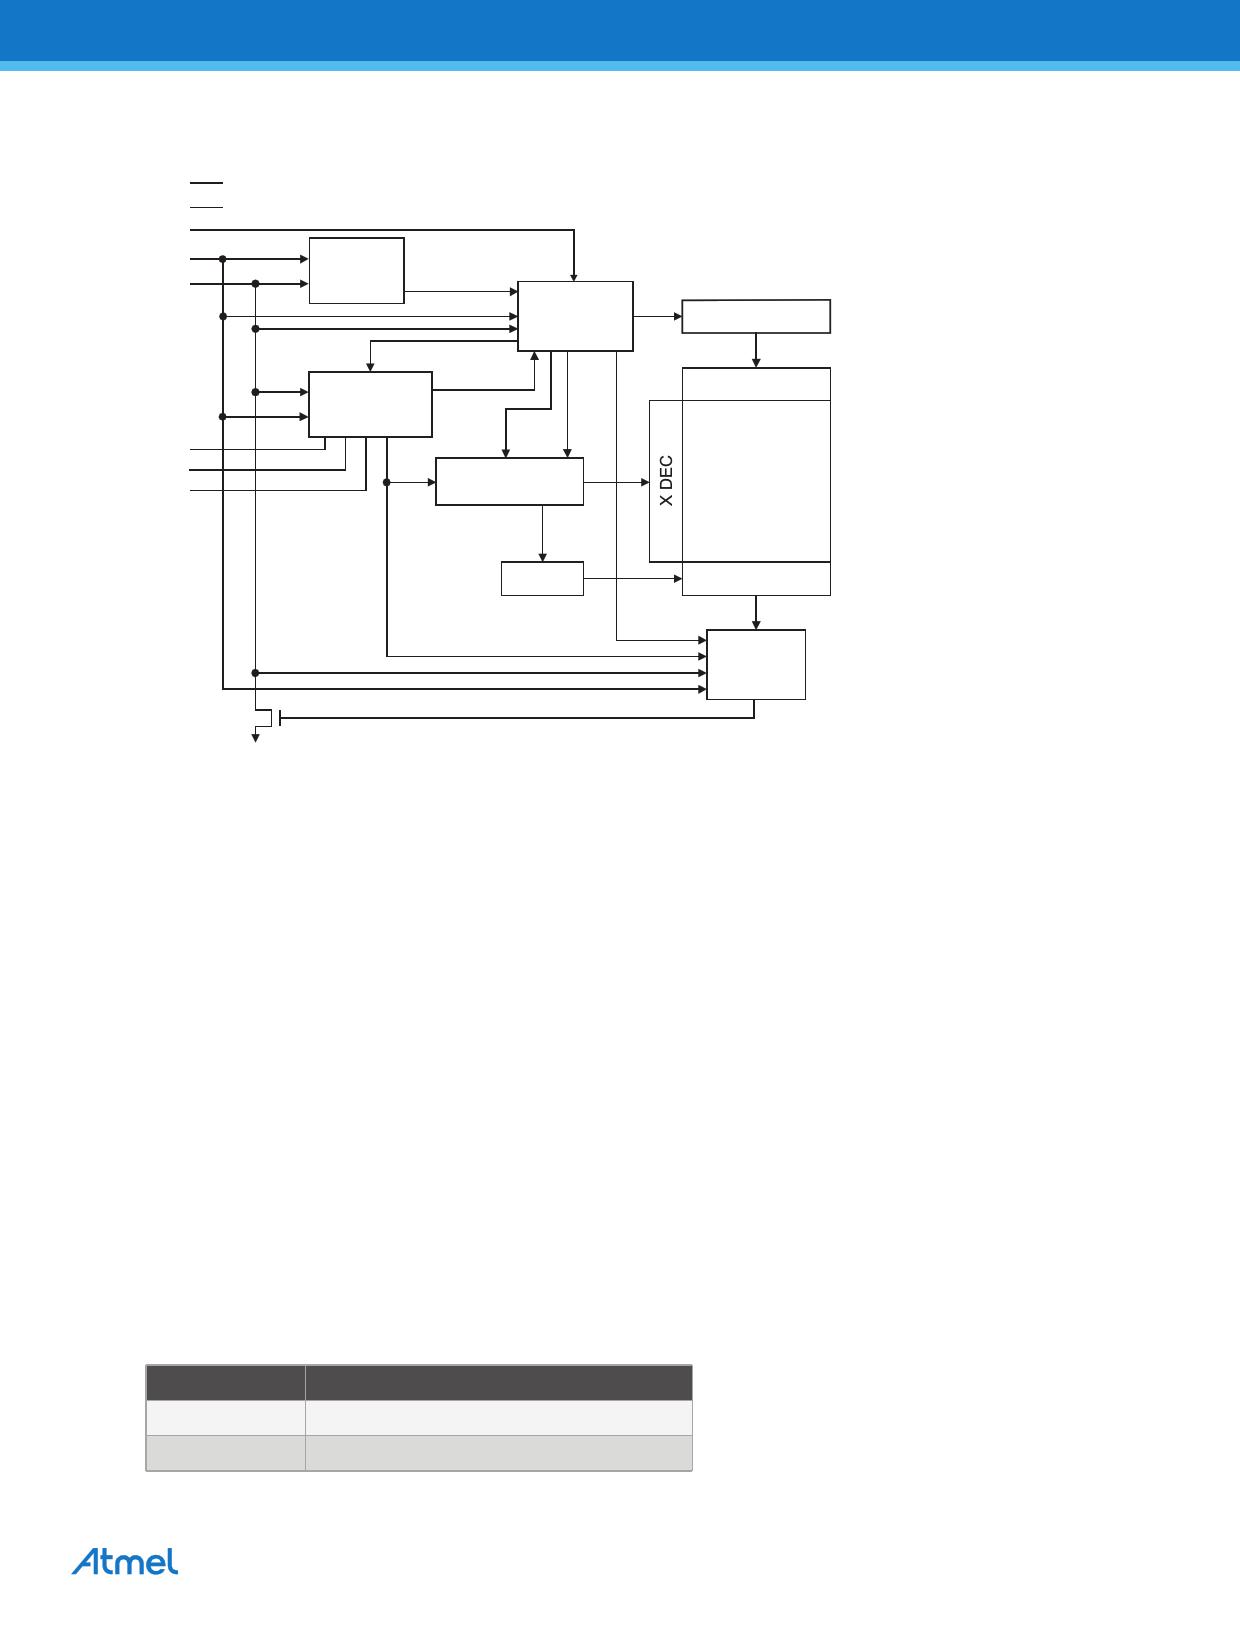 AT24C64D pdf, 電子部品, 半導体, ピン配列